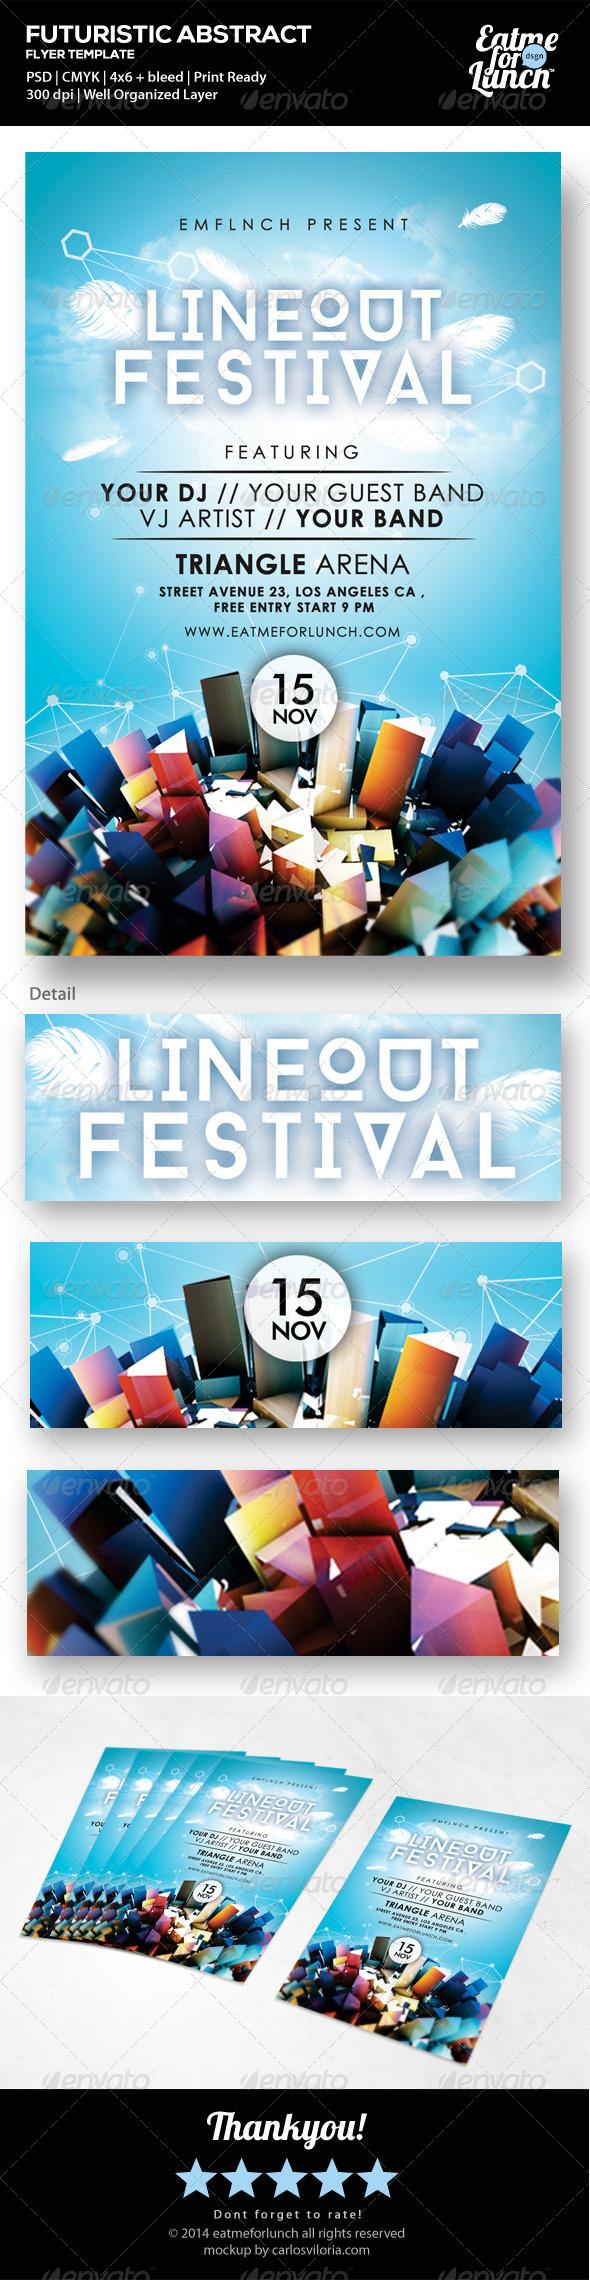 GraphicRiver Futuristic Abstract Music Festival Flyer Templates 7252451